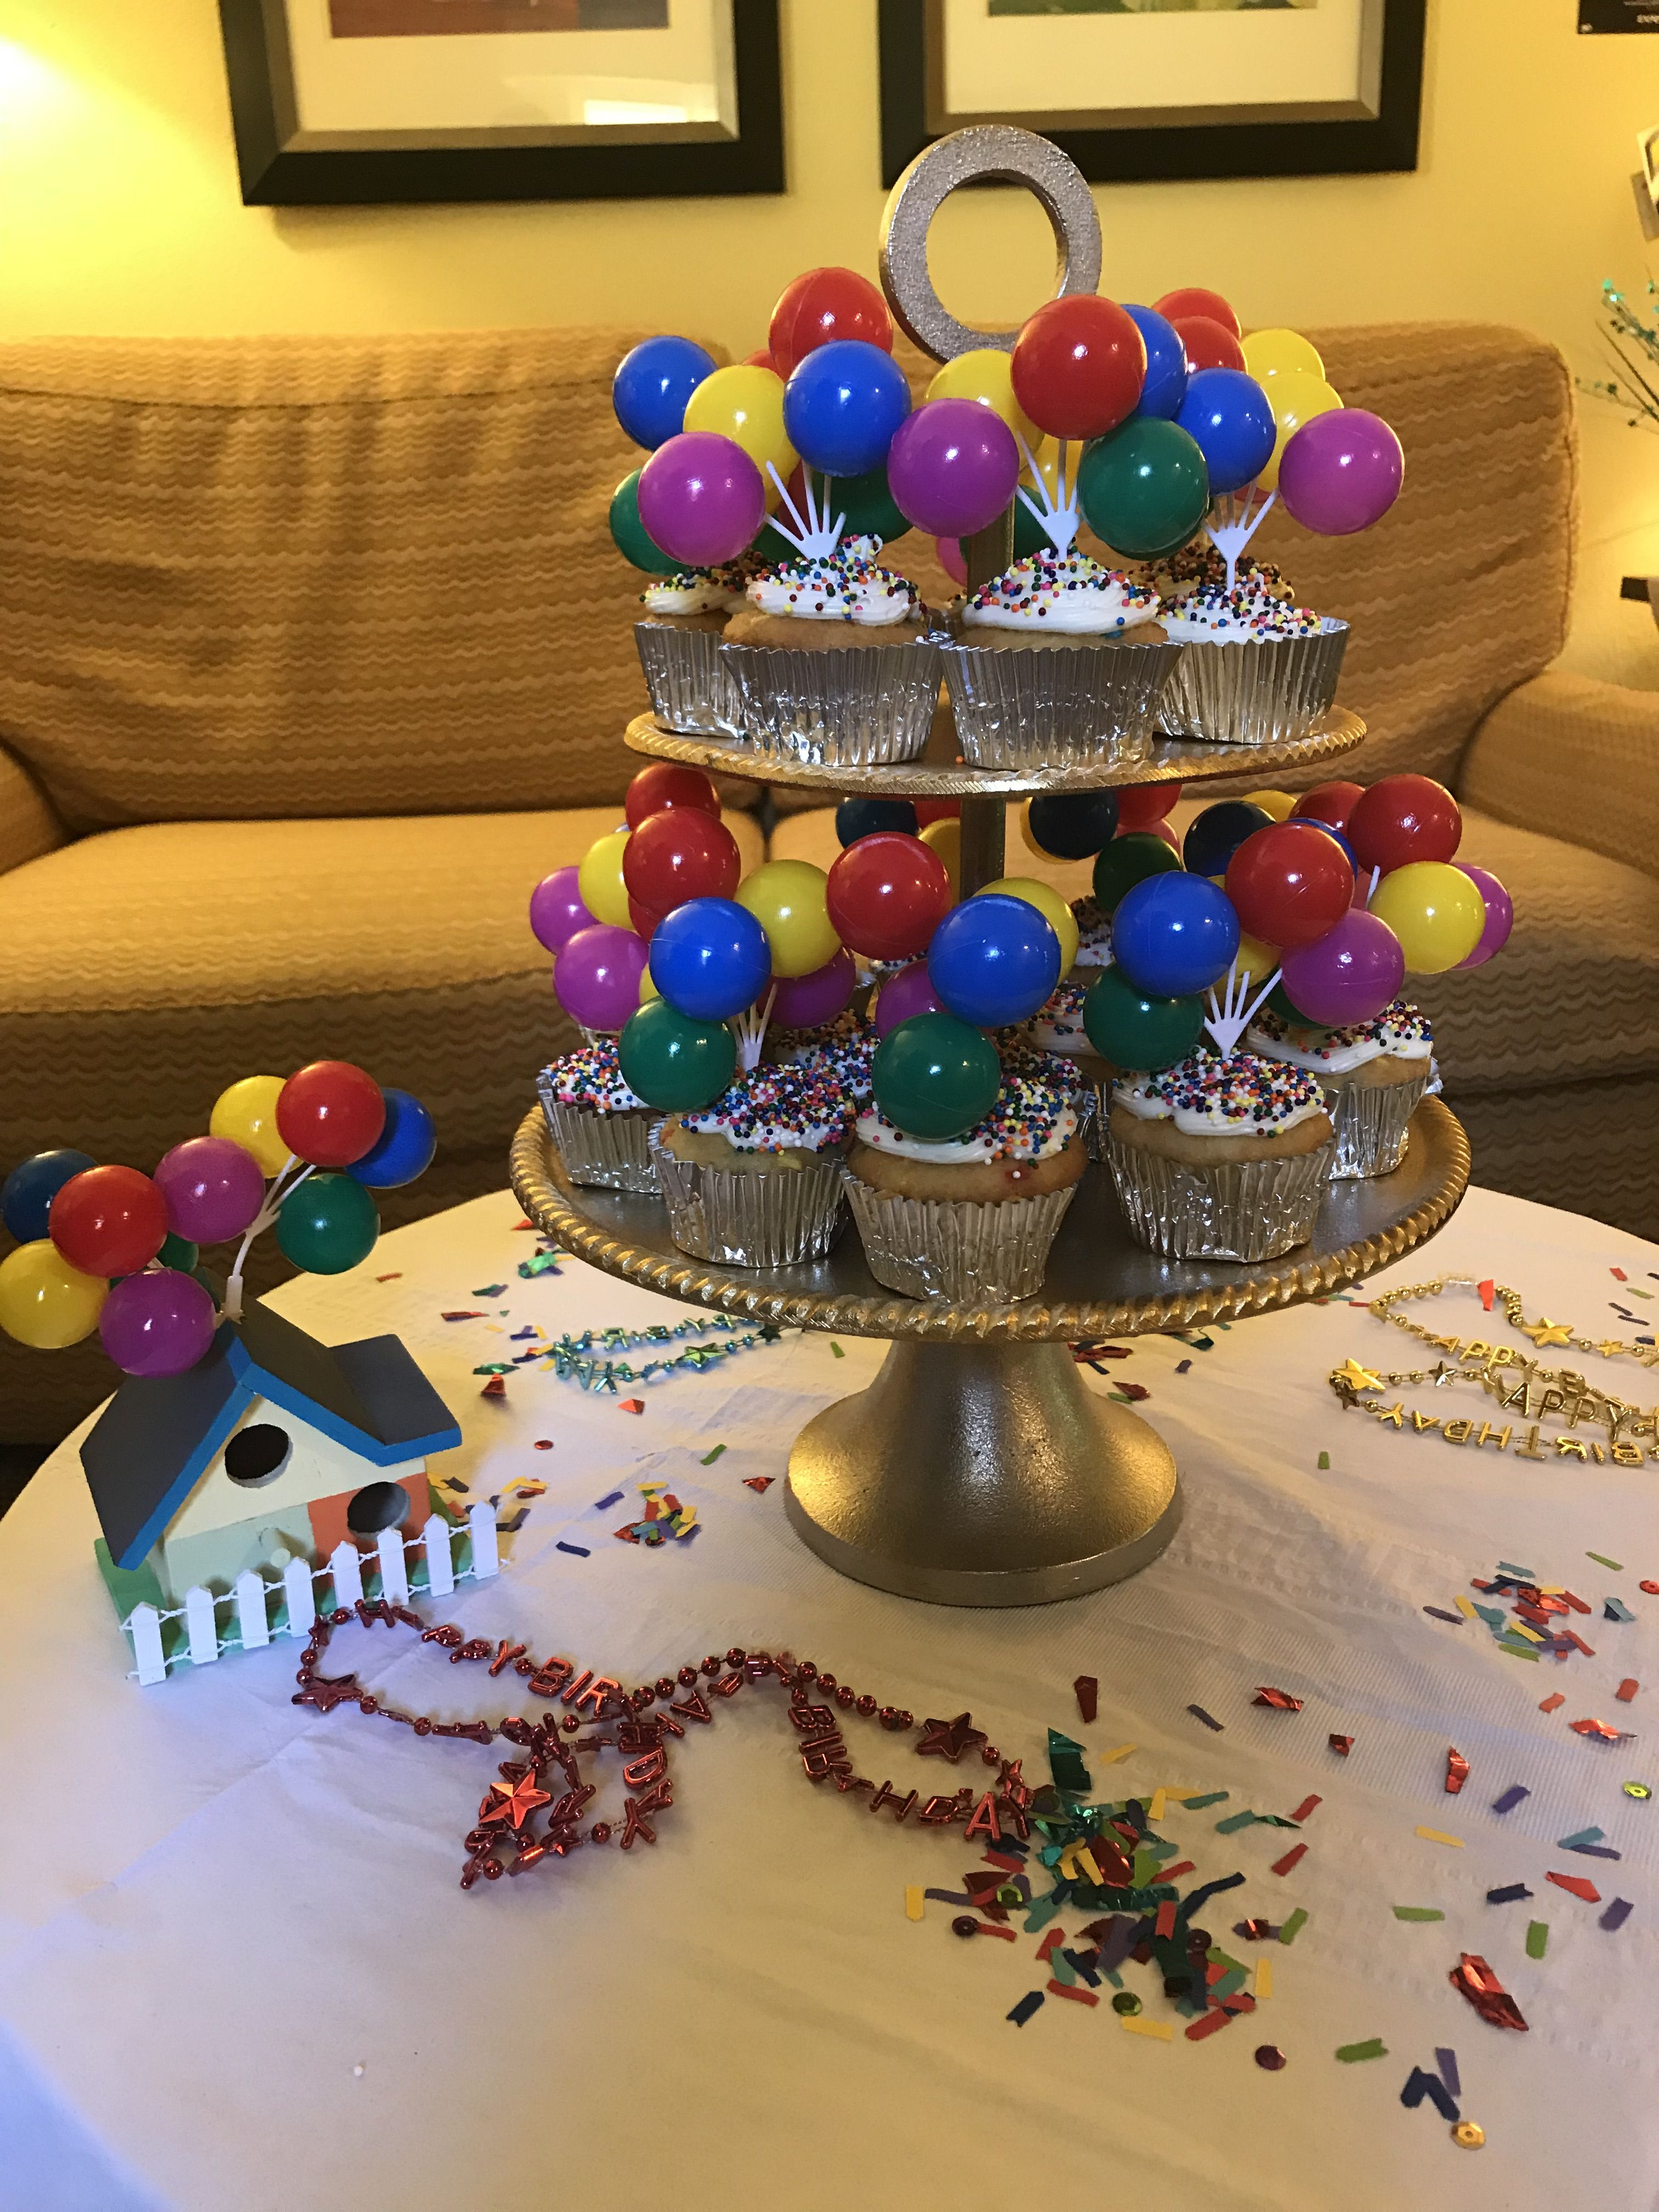 Pixars Up Themed Birthday Party #Cupcakes #Up #Pixar